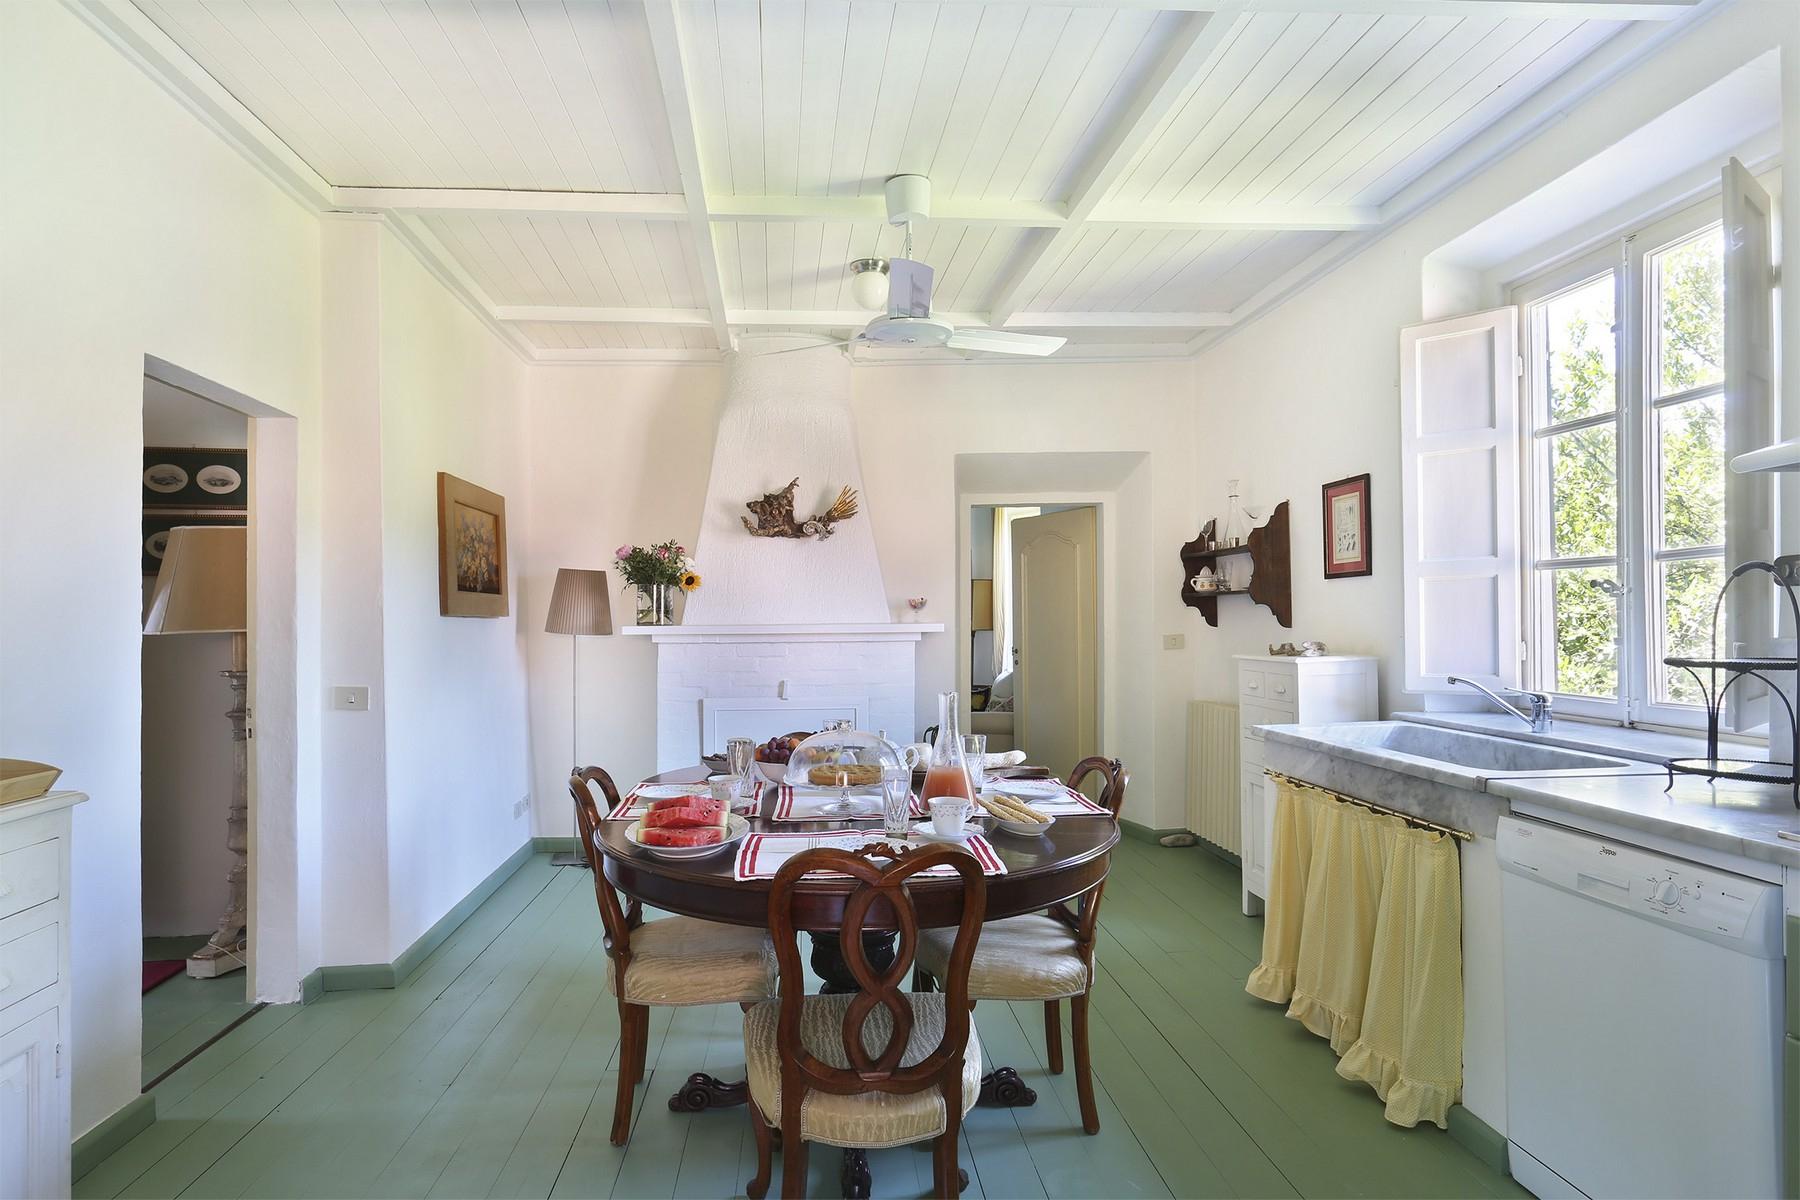 Villa in Vendita a Lucca: 5 locali, 735 mq - Foto 11